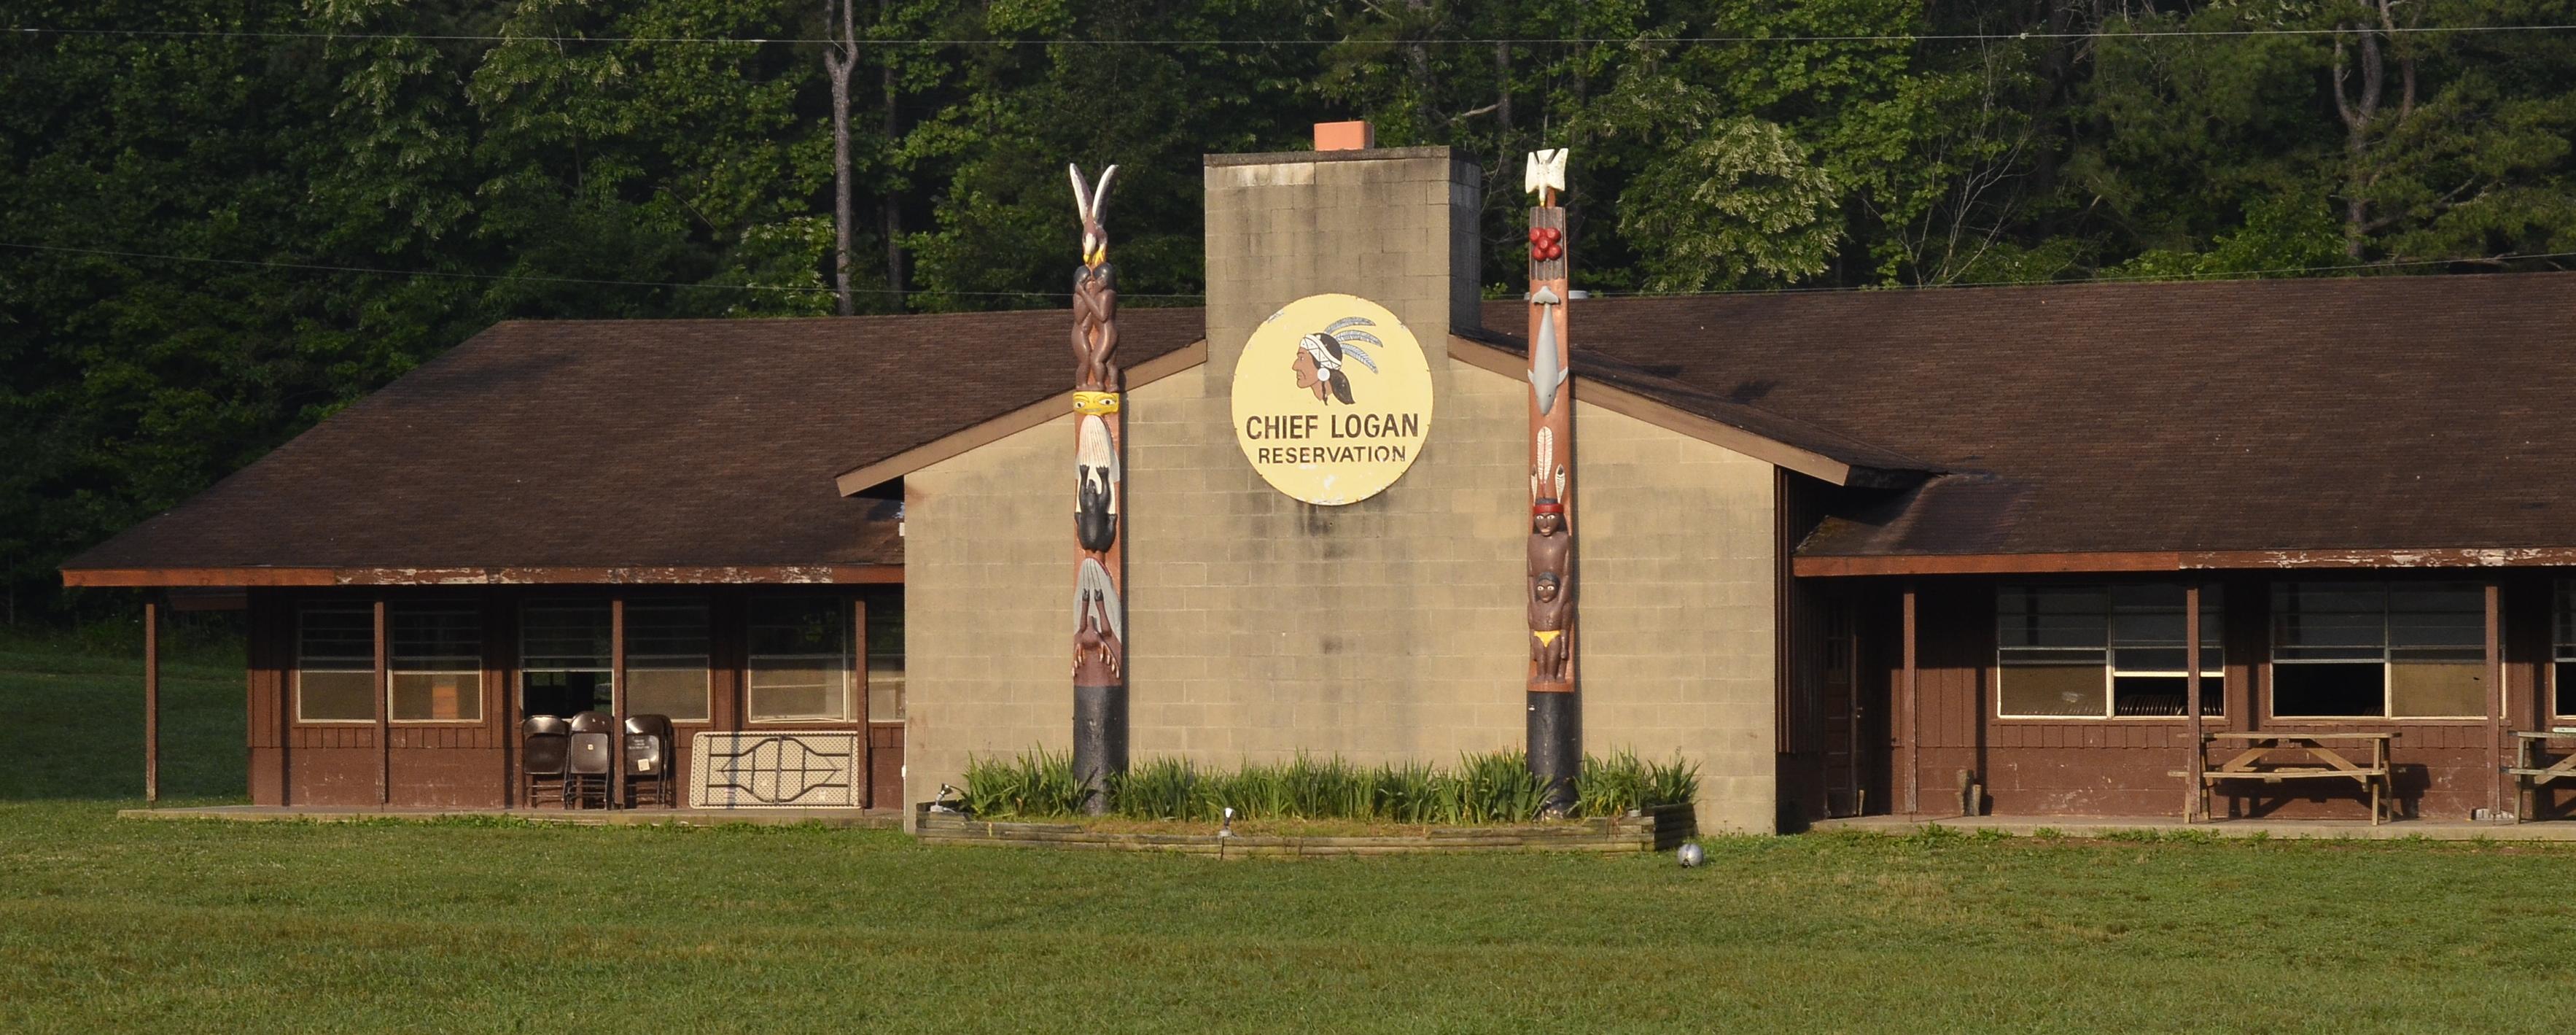 Chief Logan Reservation